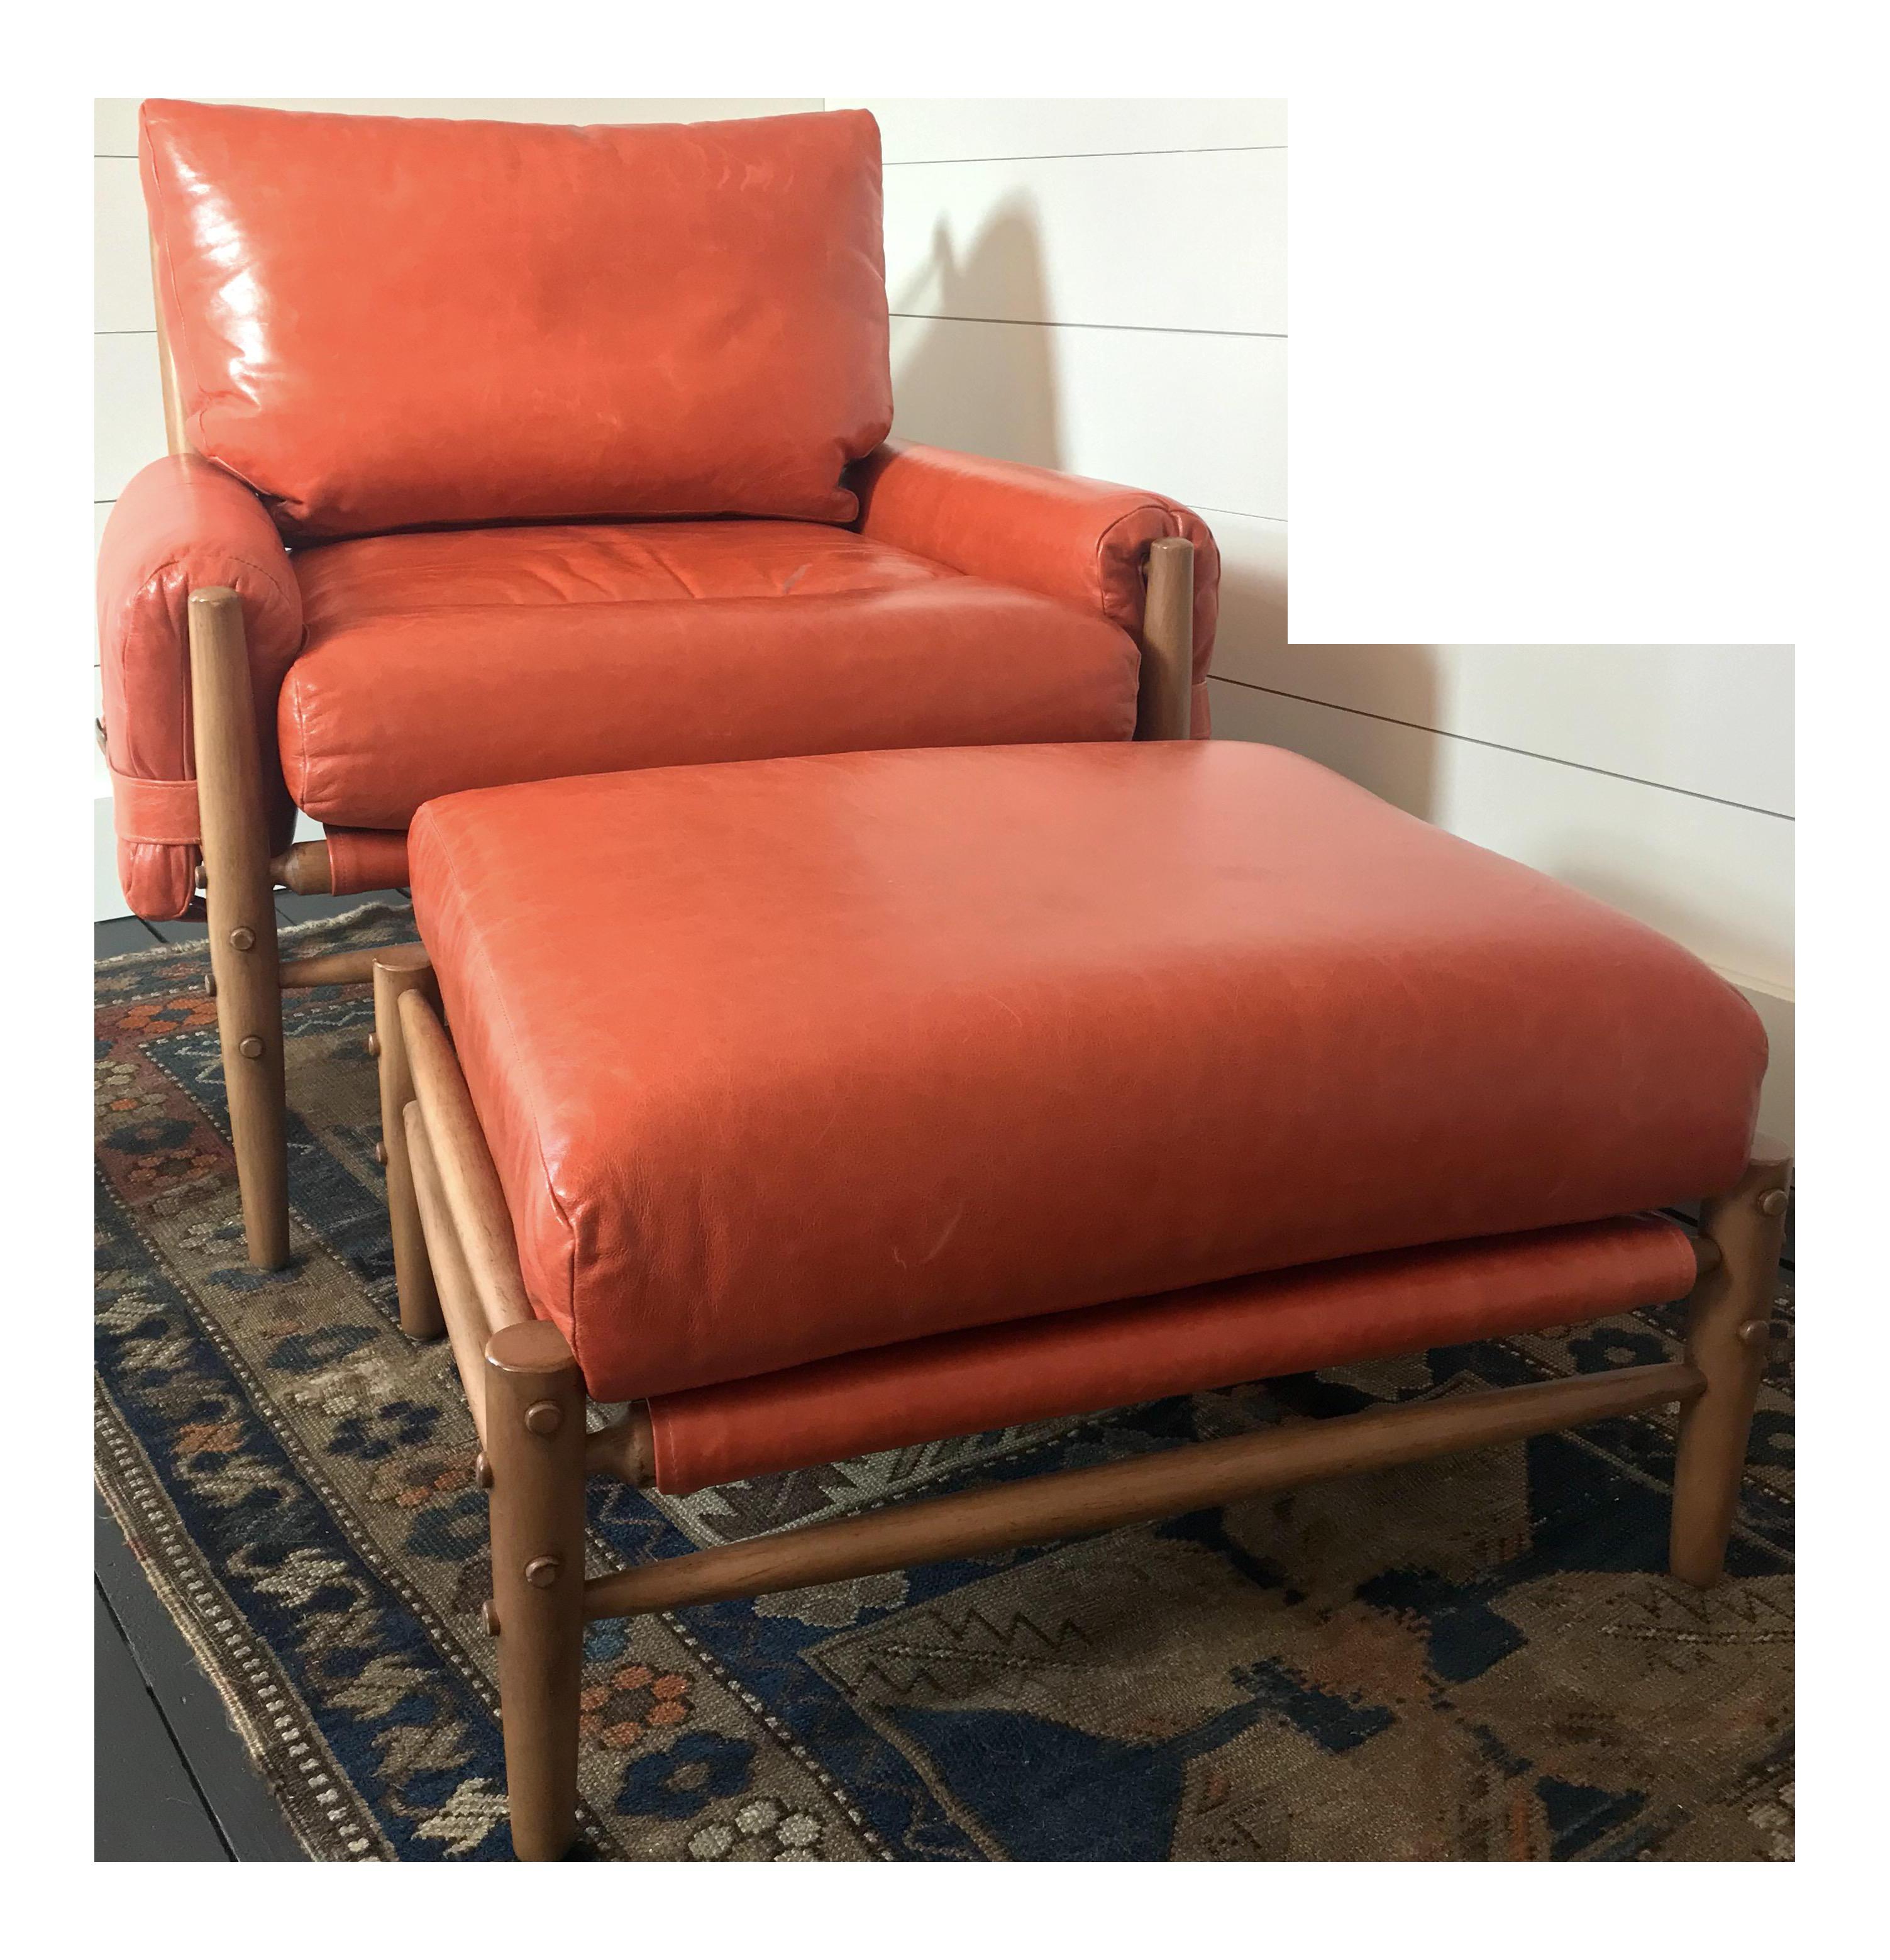 Anthropologie Rhys Lounge Leather Chair U0026 Ottoman